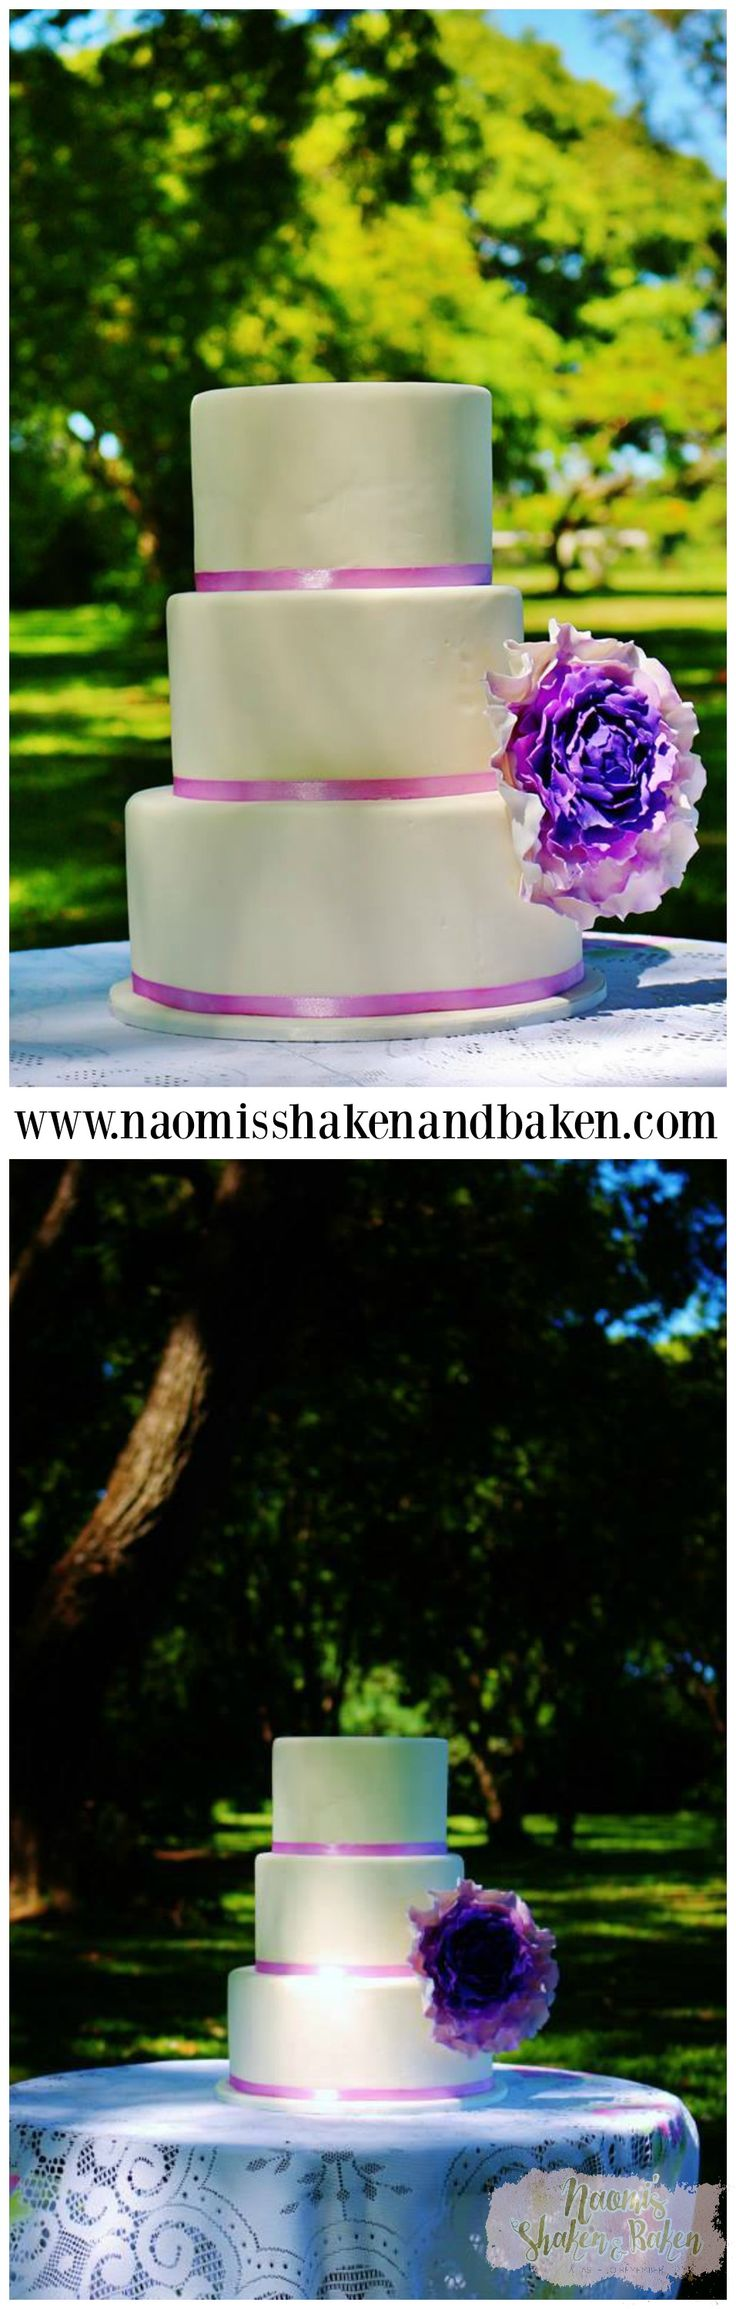 Wedding cake, wedding cupcakes, wedding, wedding planner, wedding event, gold coast, sunshine coast, Brisbane, hinterland weddings, romantic, rustic, vintage, simple, elegant, stunning, beautiful, love, breath taking, lovely, gorgeous, luxury, quality, cake, divine, mud cakes, vegan cakes, gluten free cakes, tantalizing, flowers. Edible art, edible toppers, edible flowers, Bride, groom, Caboolture, cake decorator, professional